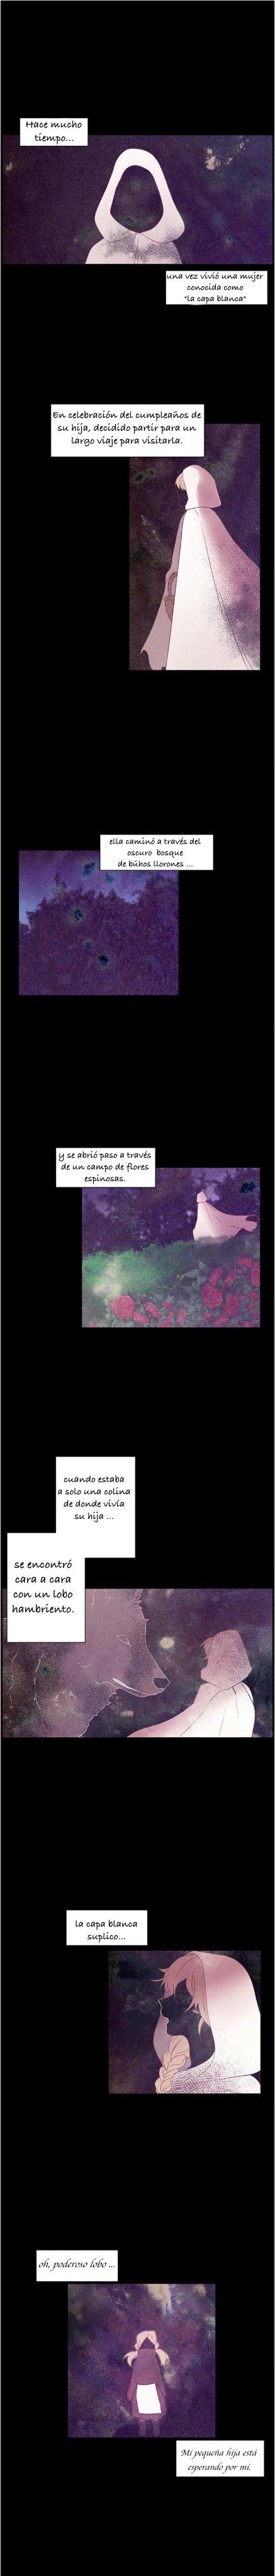 https://nine.mangadogs.com/es_manga/pic8/53/36661/946367/bf365a3674531847a287c6874d79135b.jpg Page 5